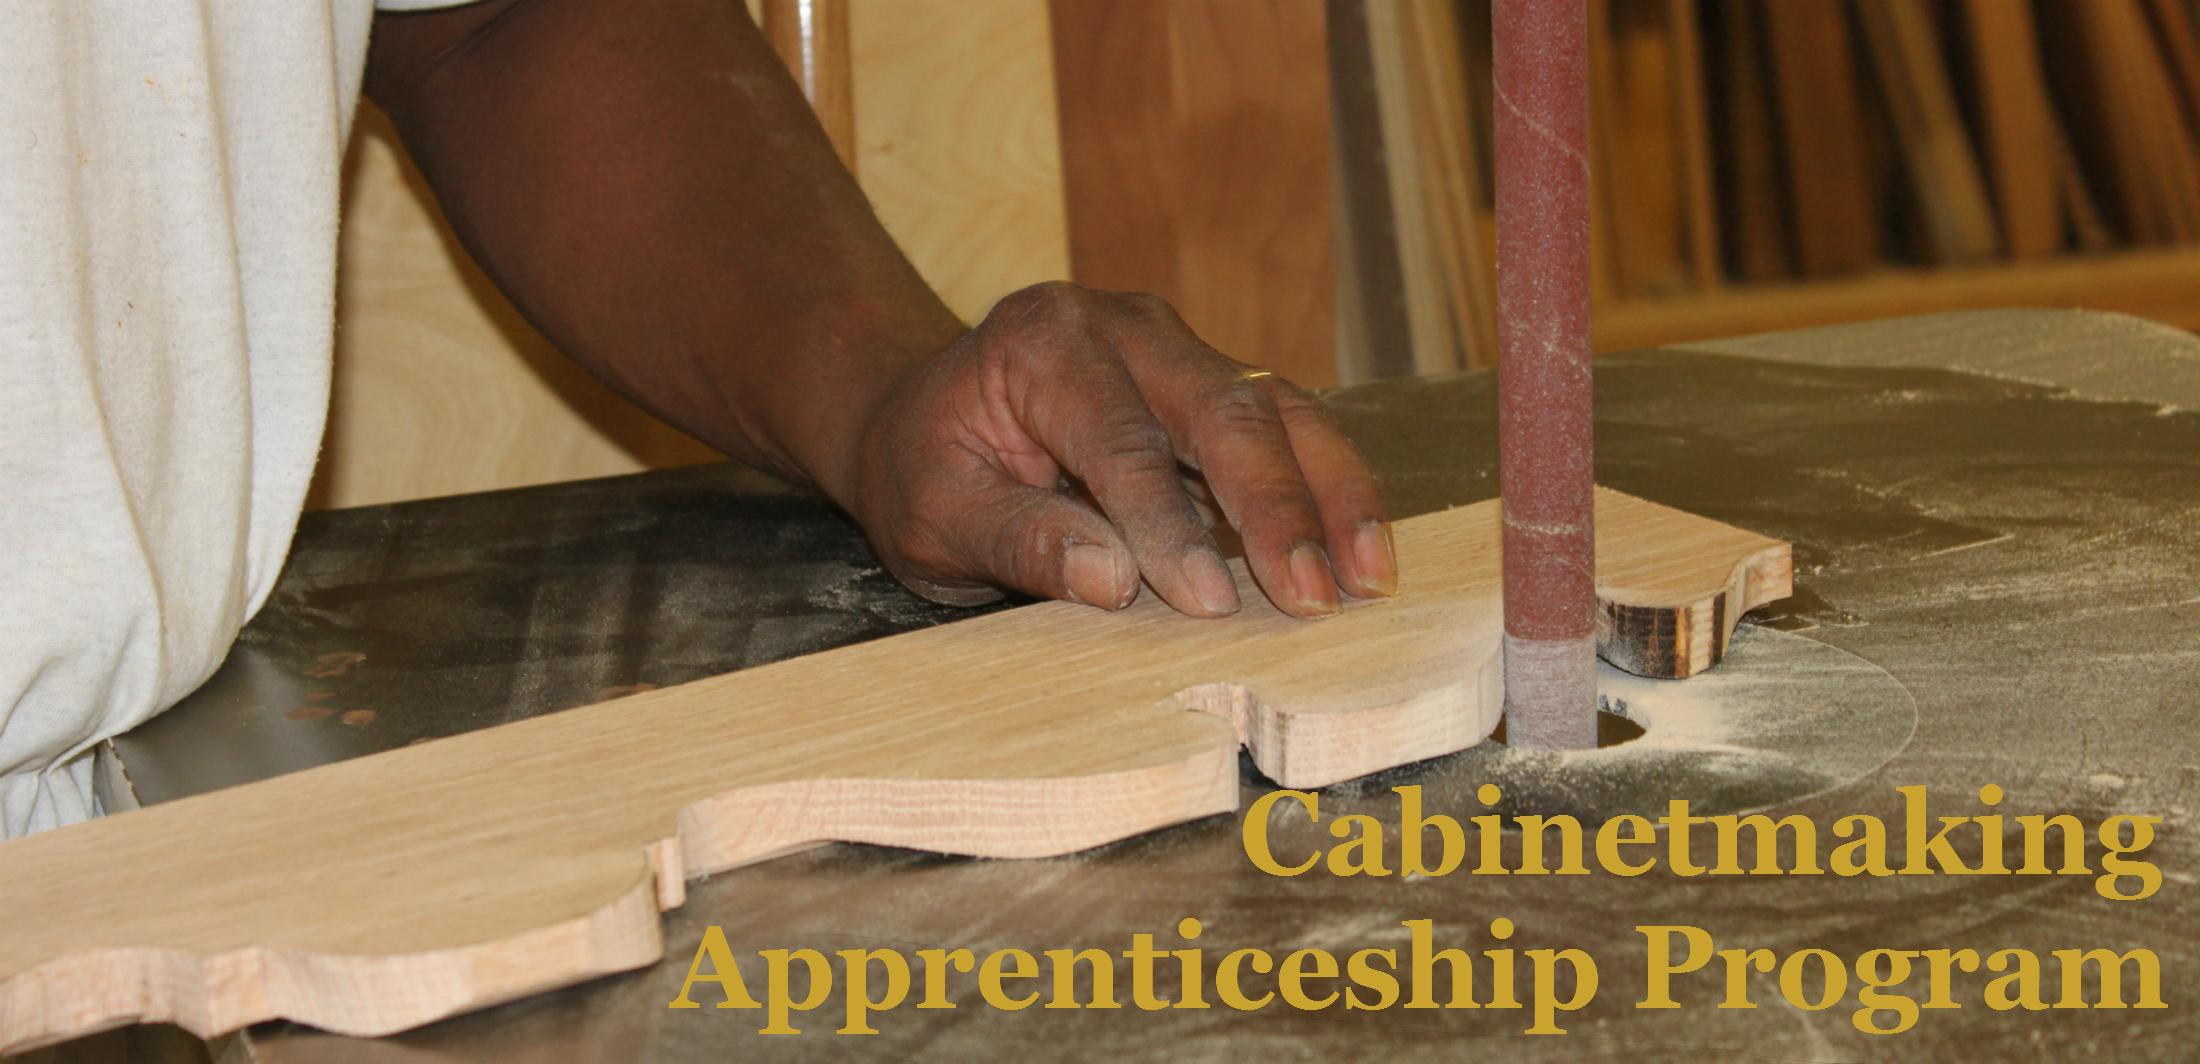 Cabinetmaking & Fine Woodworking Apprenticeship |